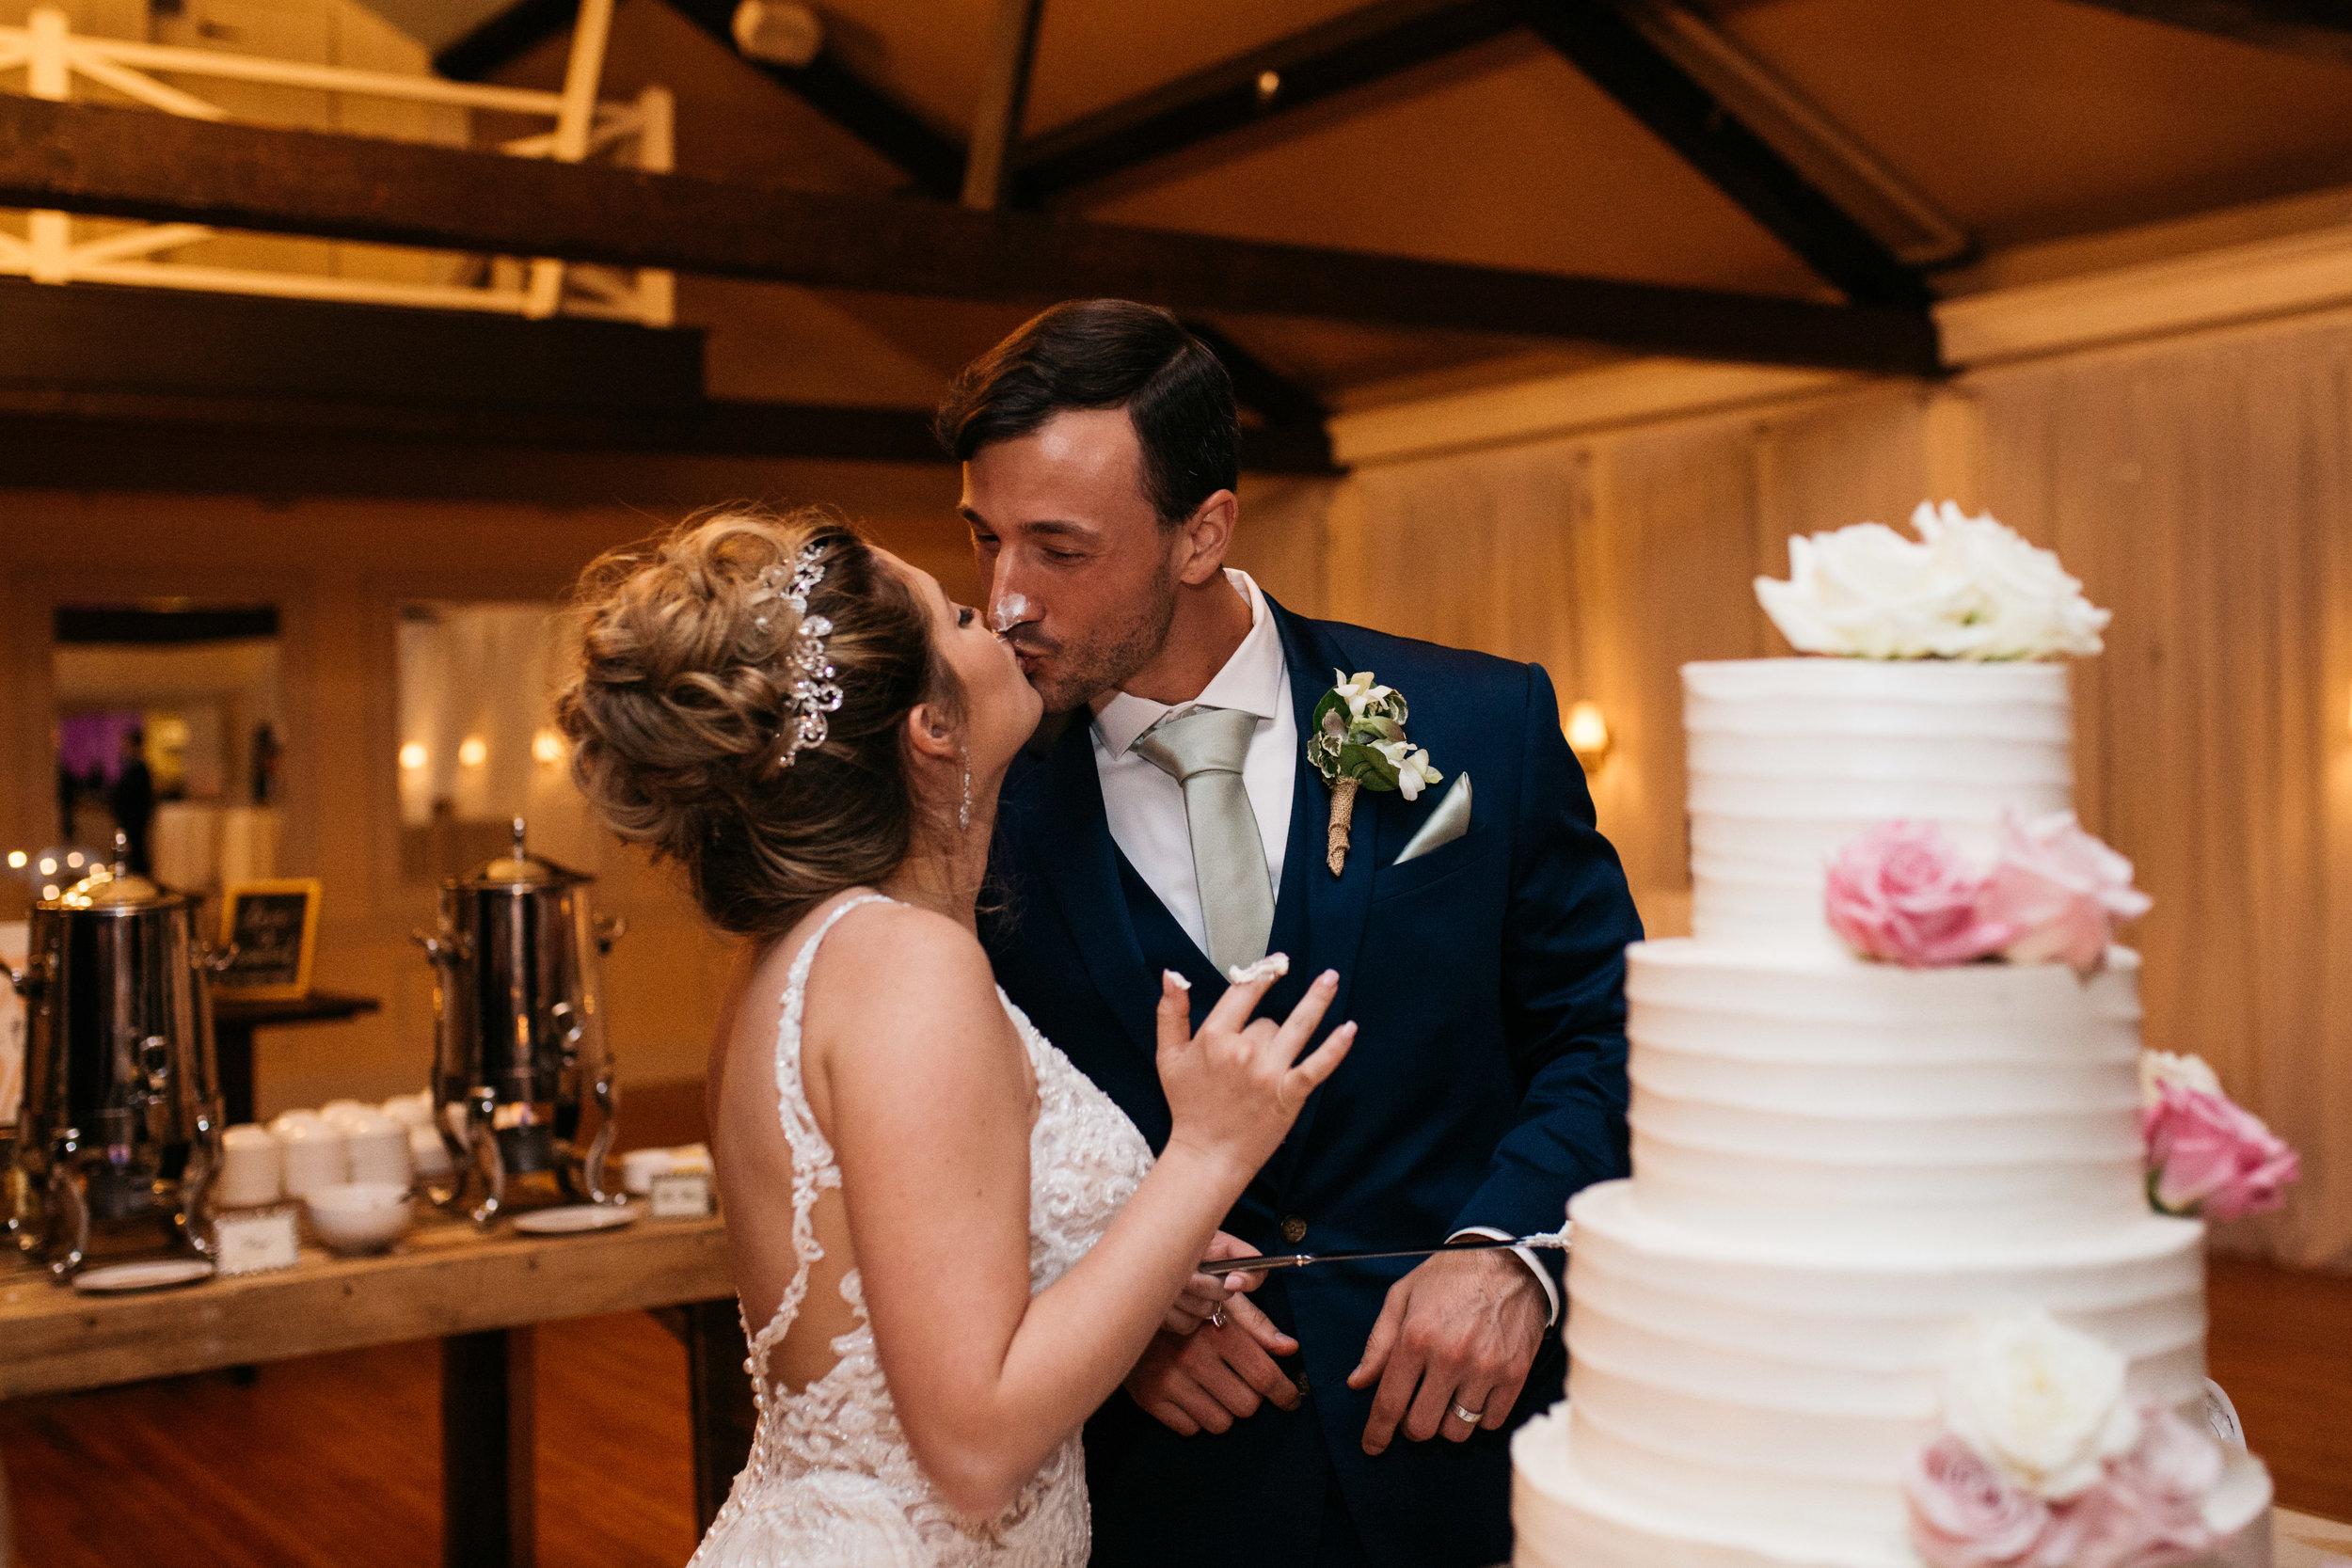 old_daley_on_crooked_lake_wedding_-103.jpg